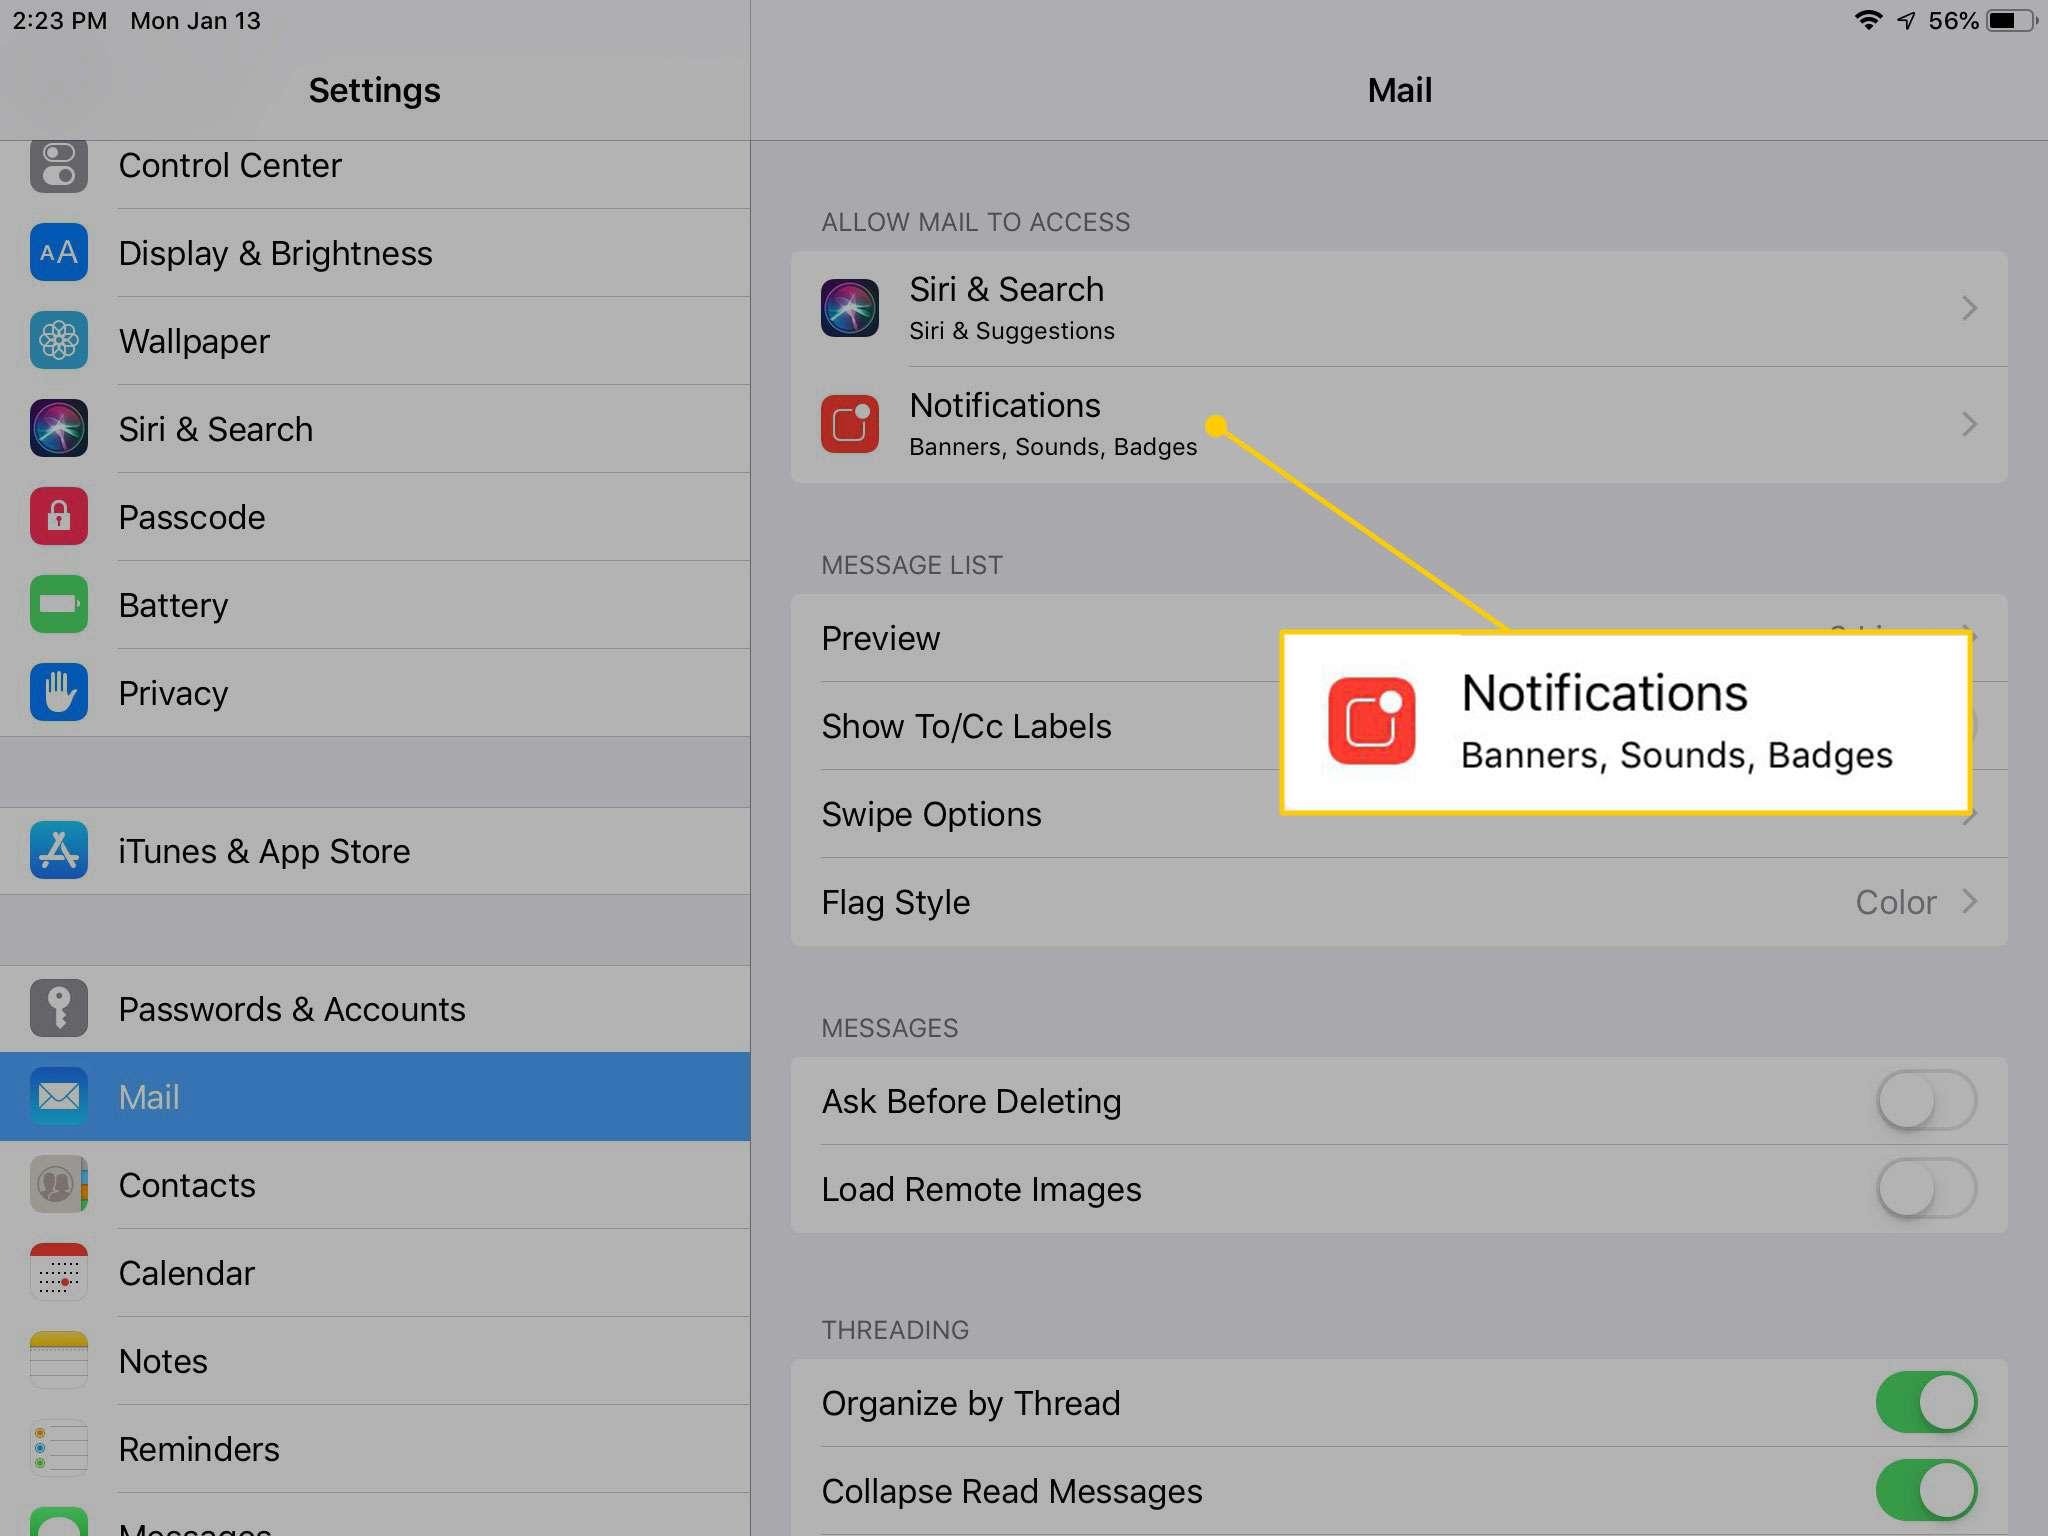 Notifications settings in iOS